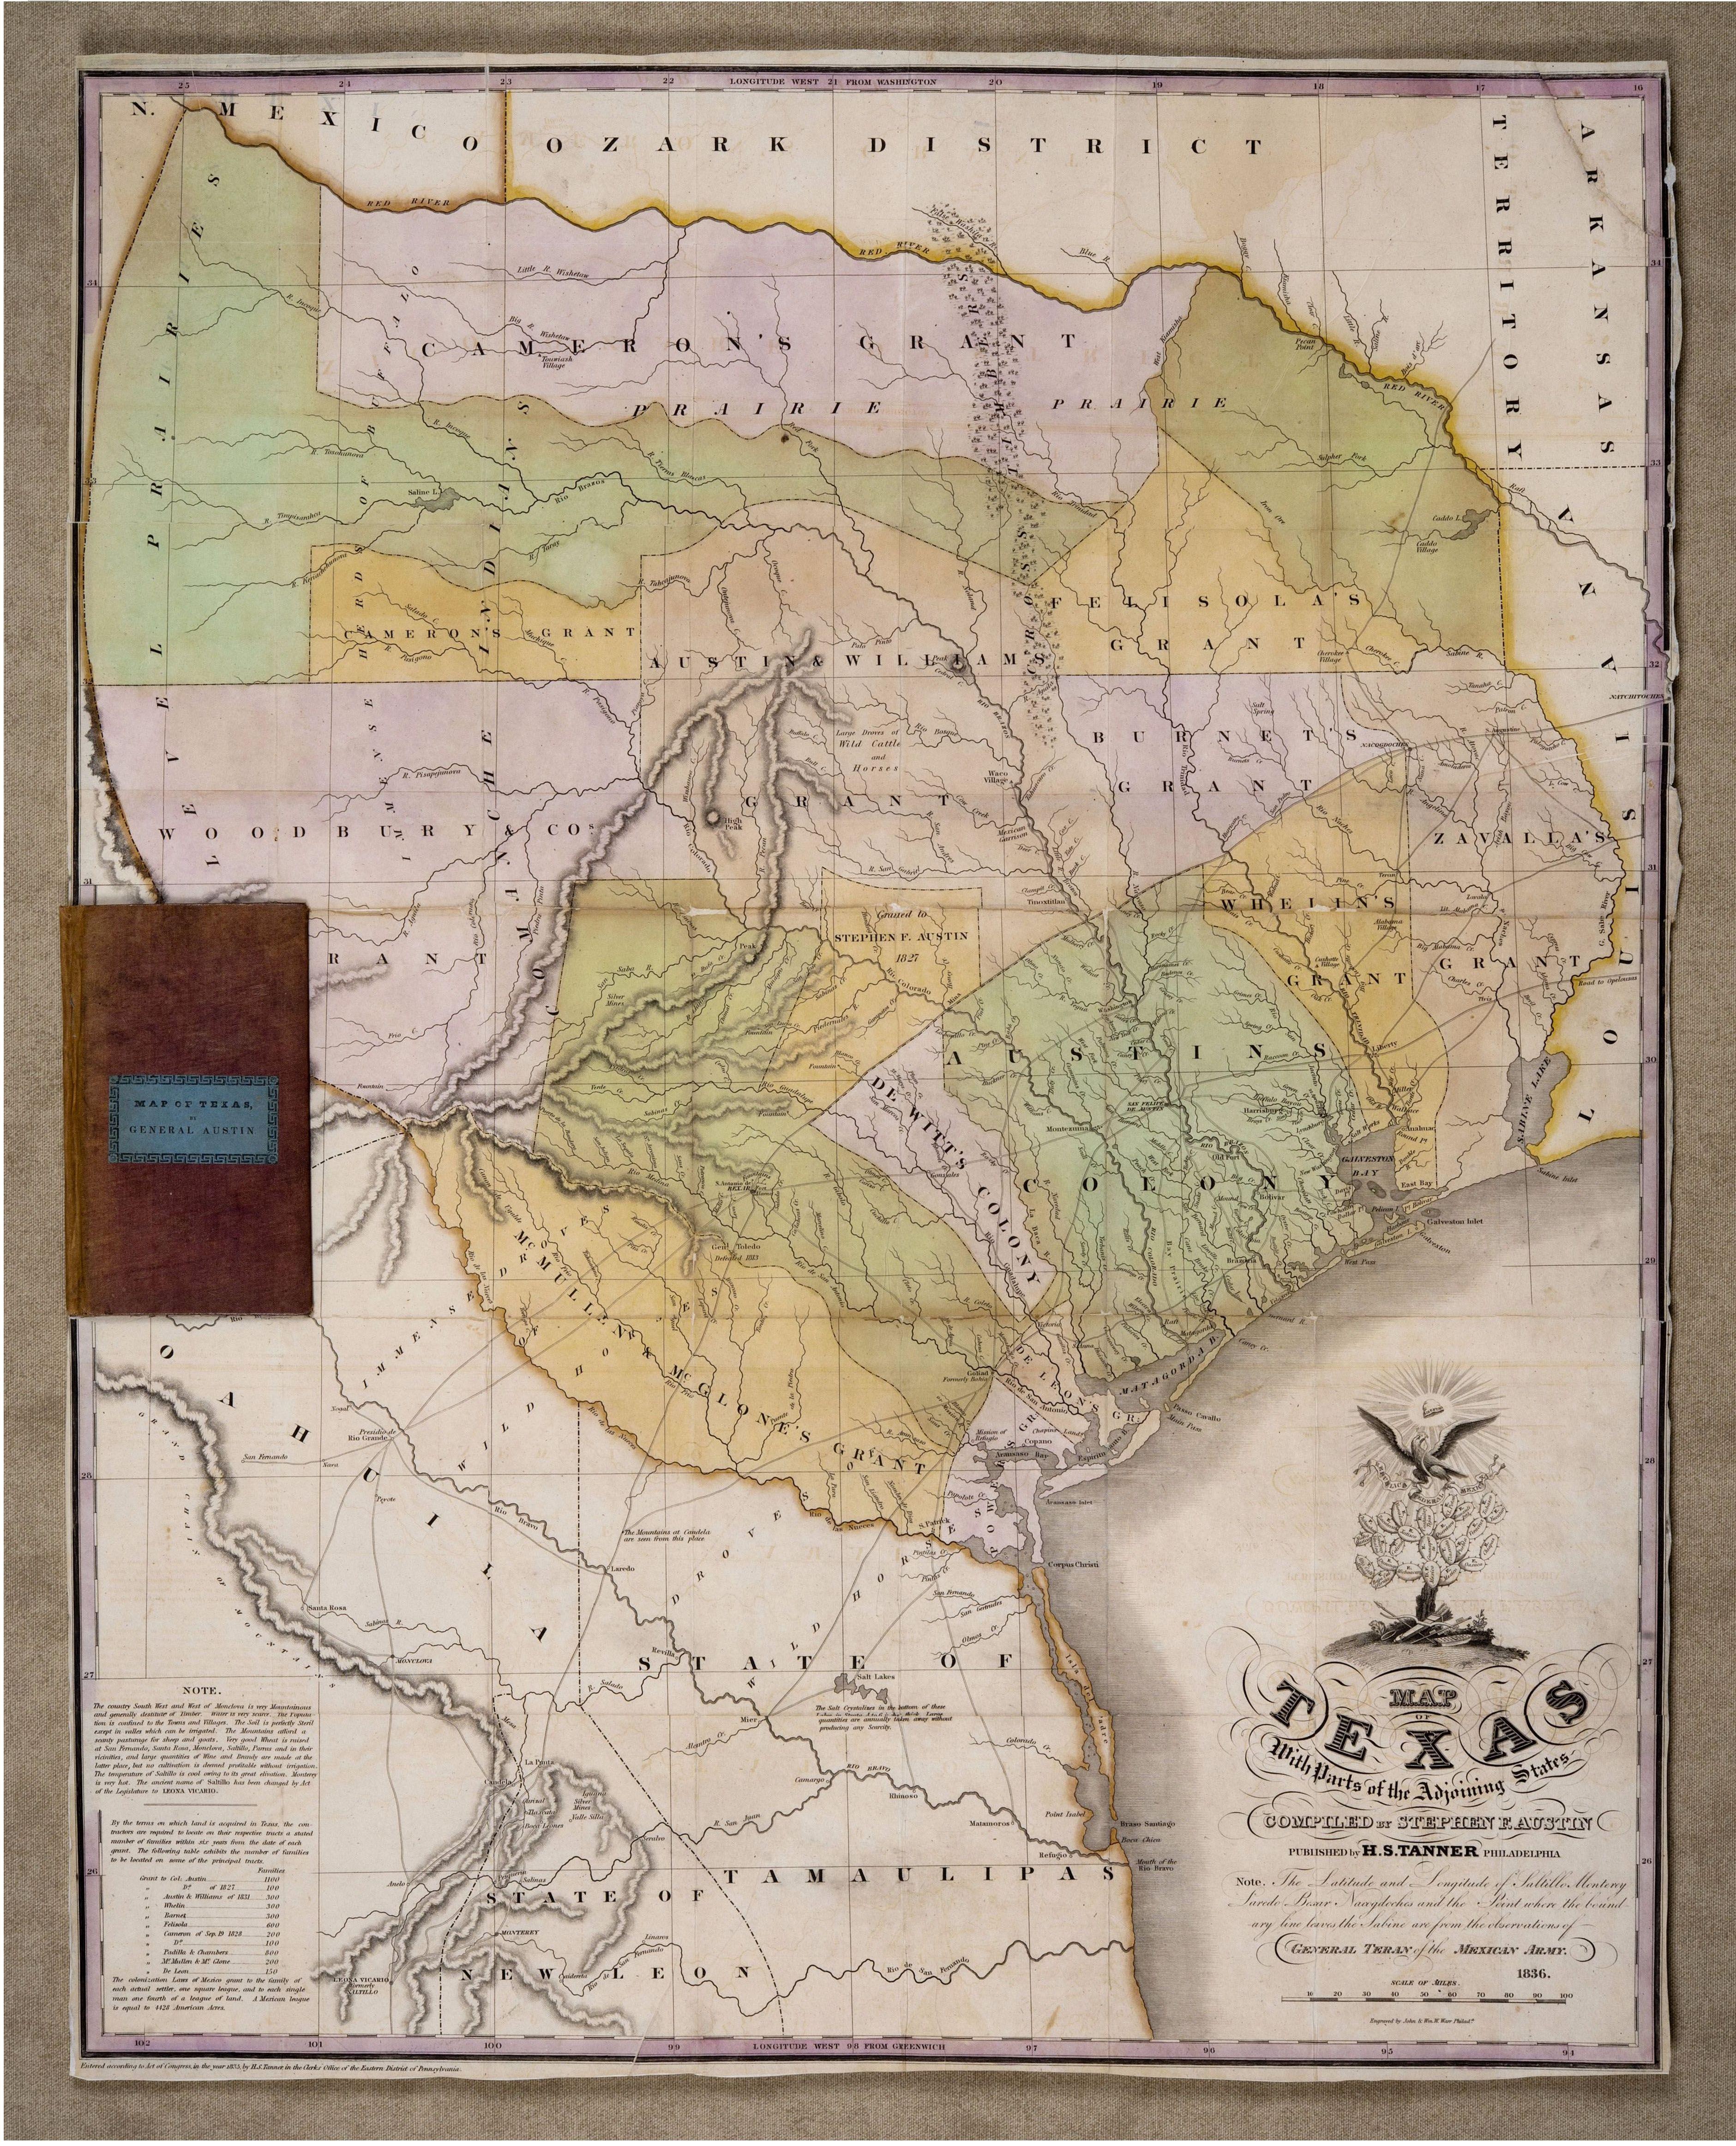 File:stephen F. Austin's Cornerstone Map Of Texas, 1836 - Stephen F Austin Map Of Texas